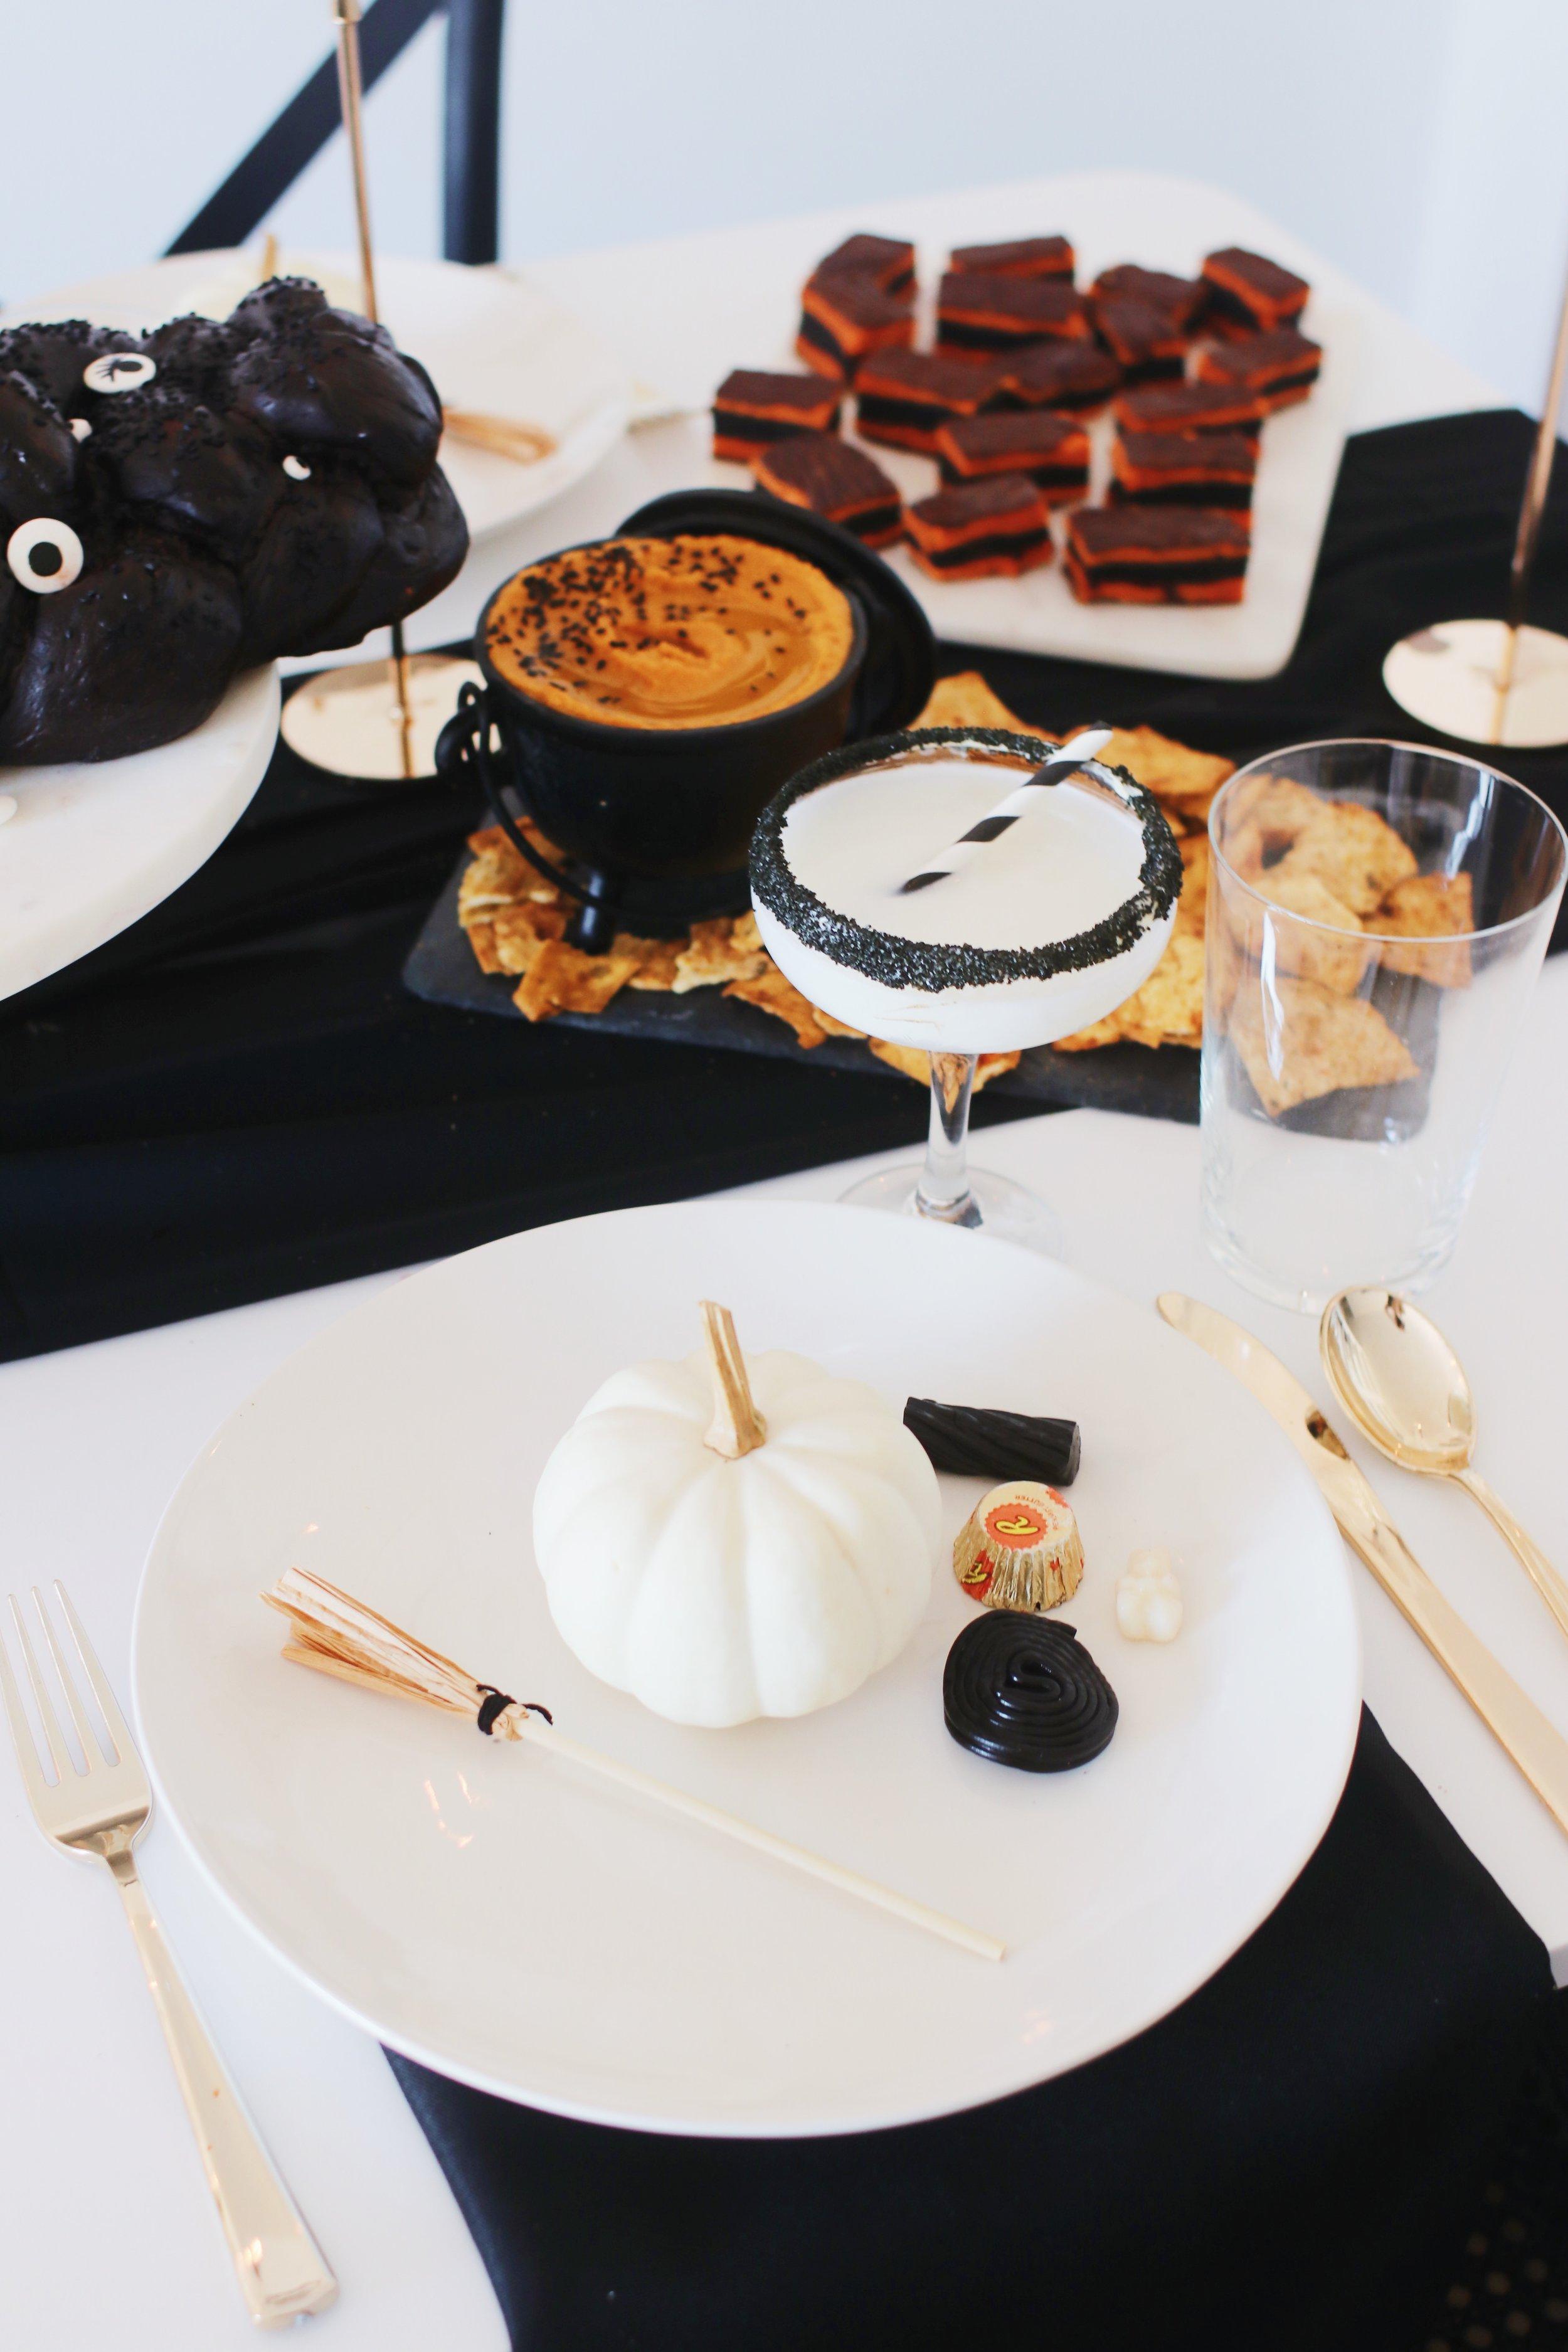 halloween-shabbat-ideas-recipes-tablescape-6.JPG